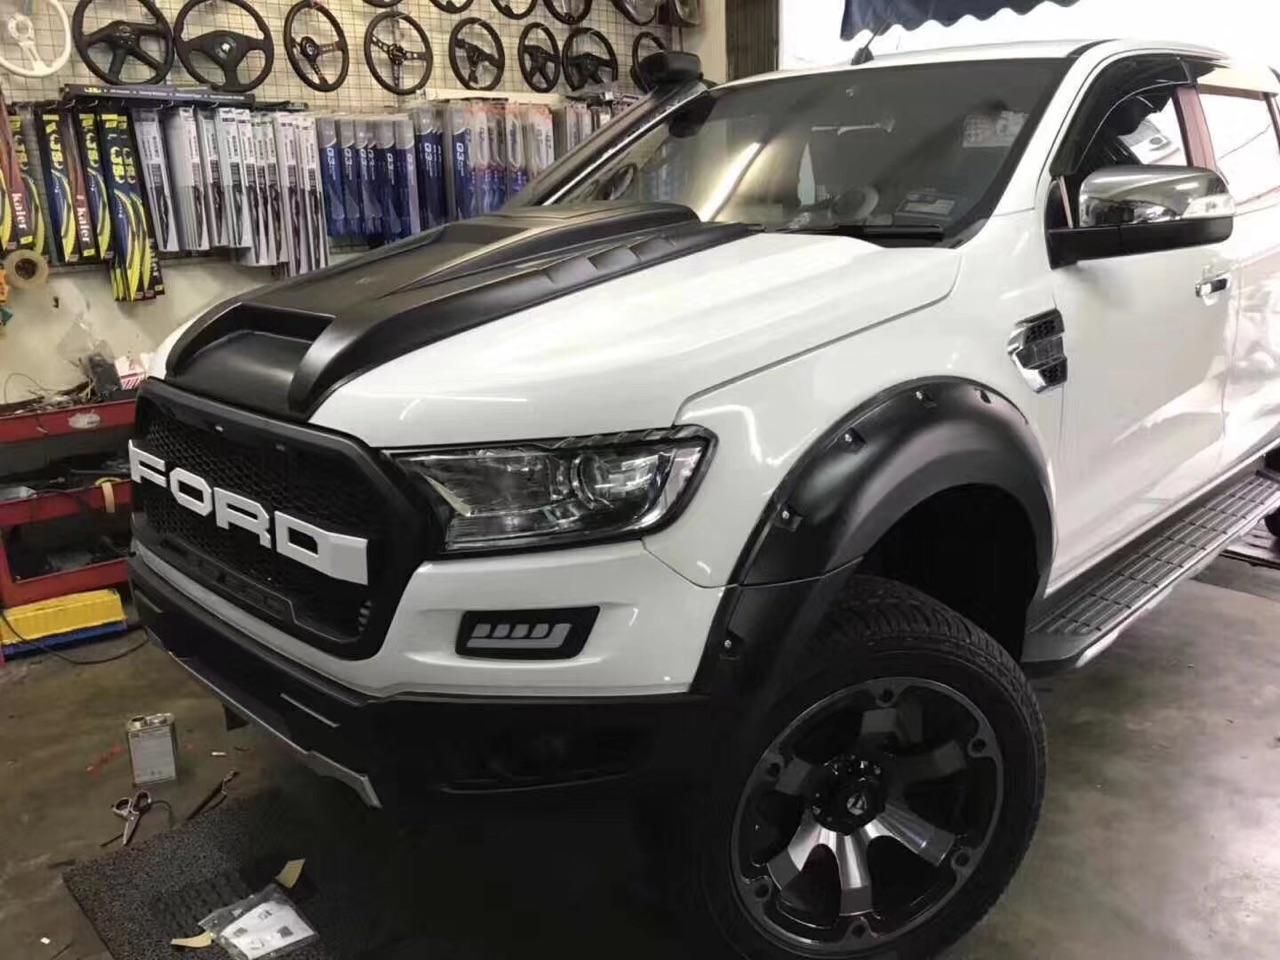 Ford Ranger Raptor Body Kit For Sale Xl Xls Xlt Wildtrak